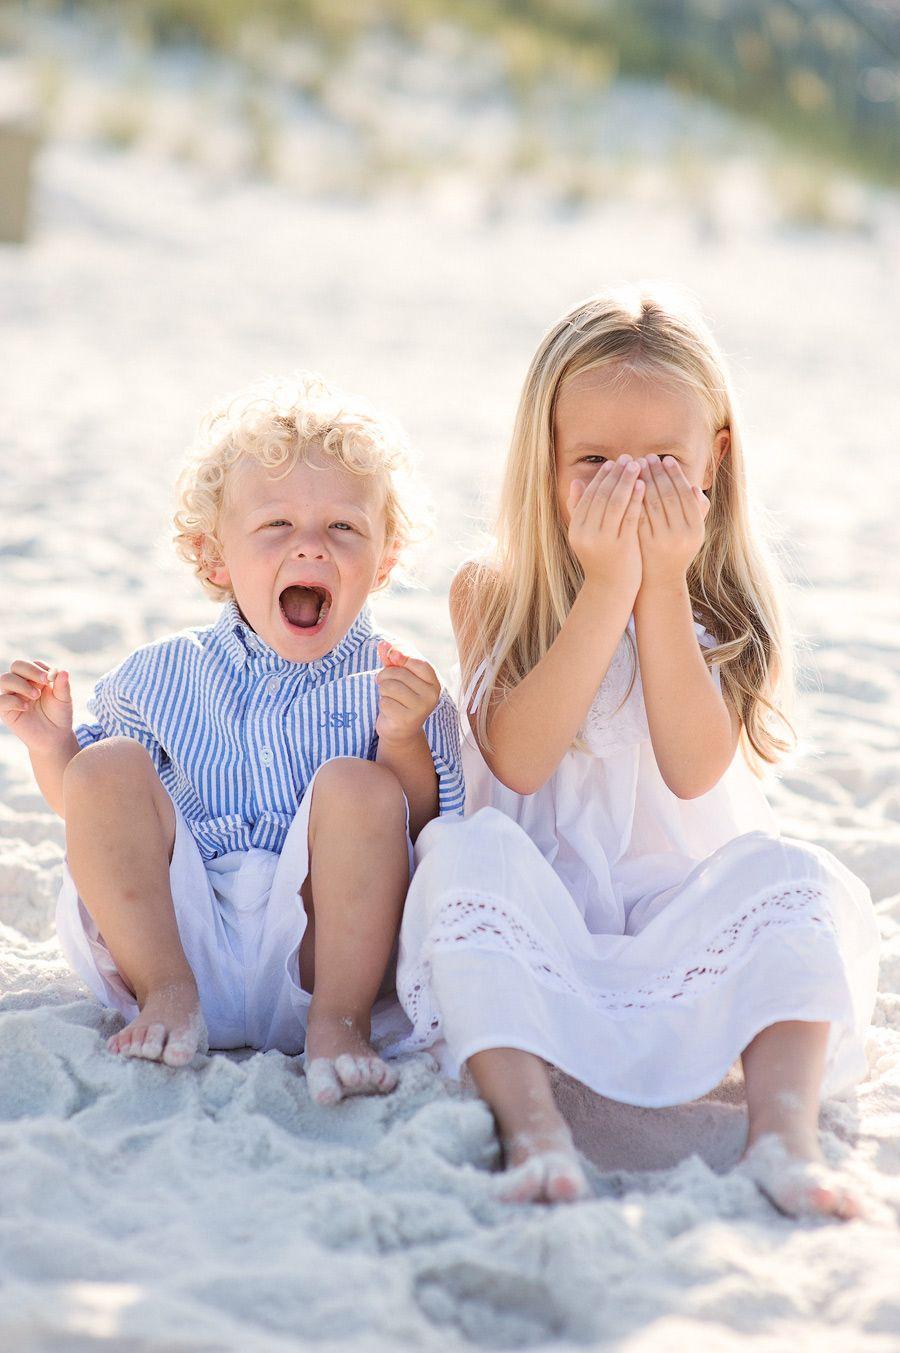 Pin by Tefi S. on sweet innocence kids Children, Blue